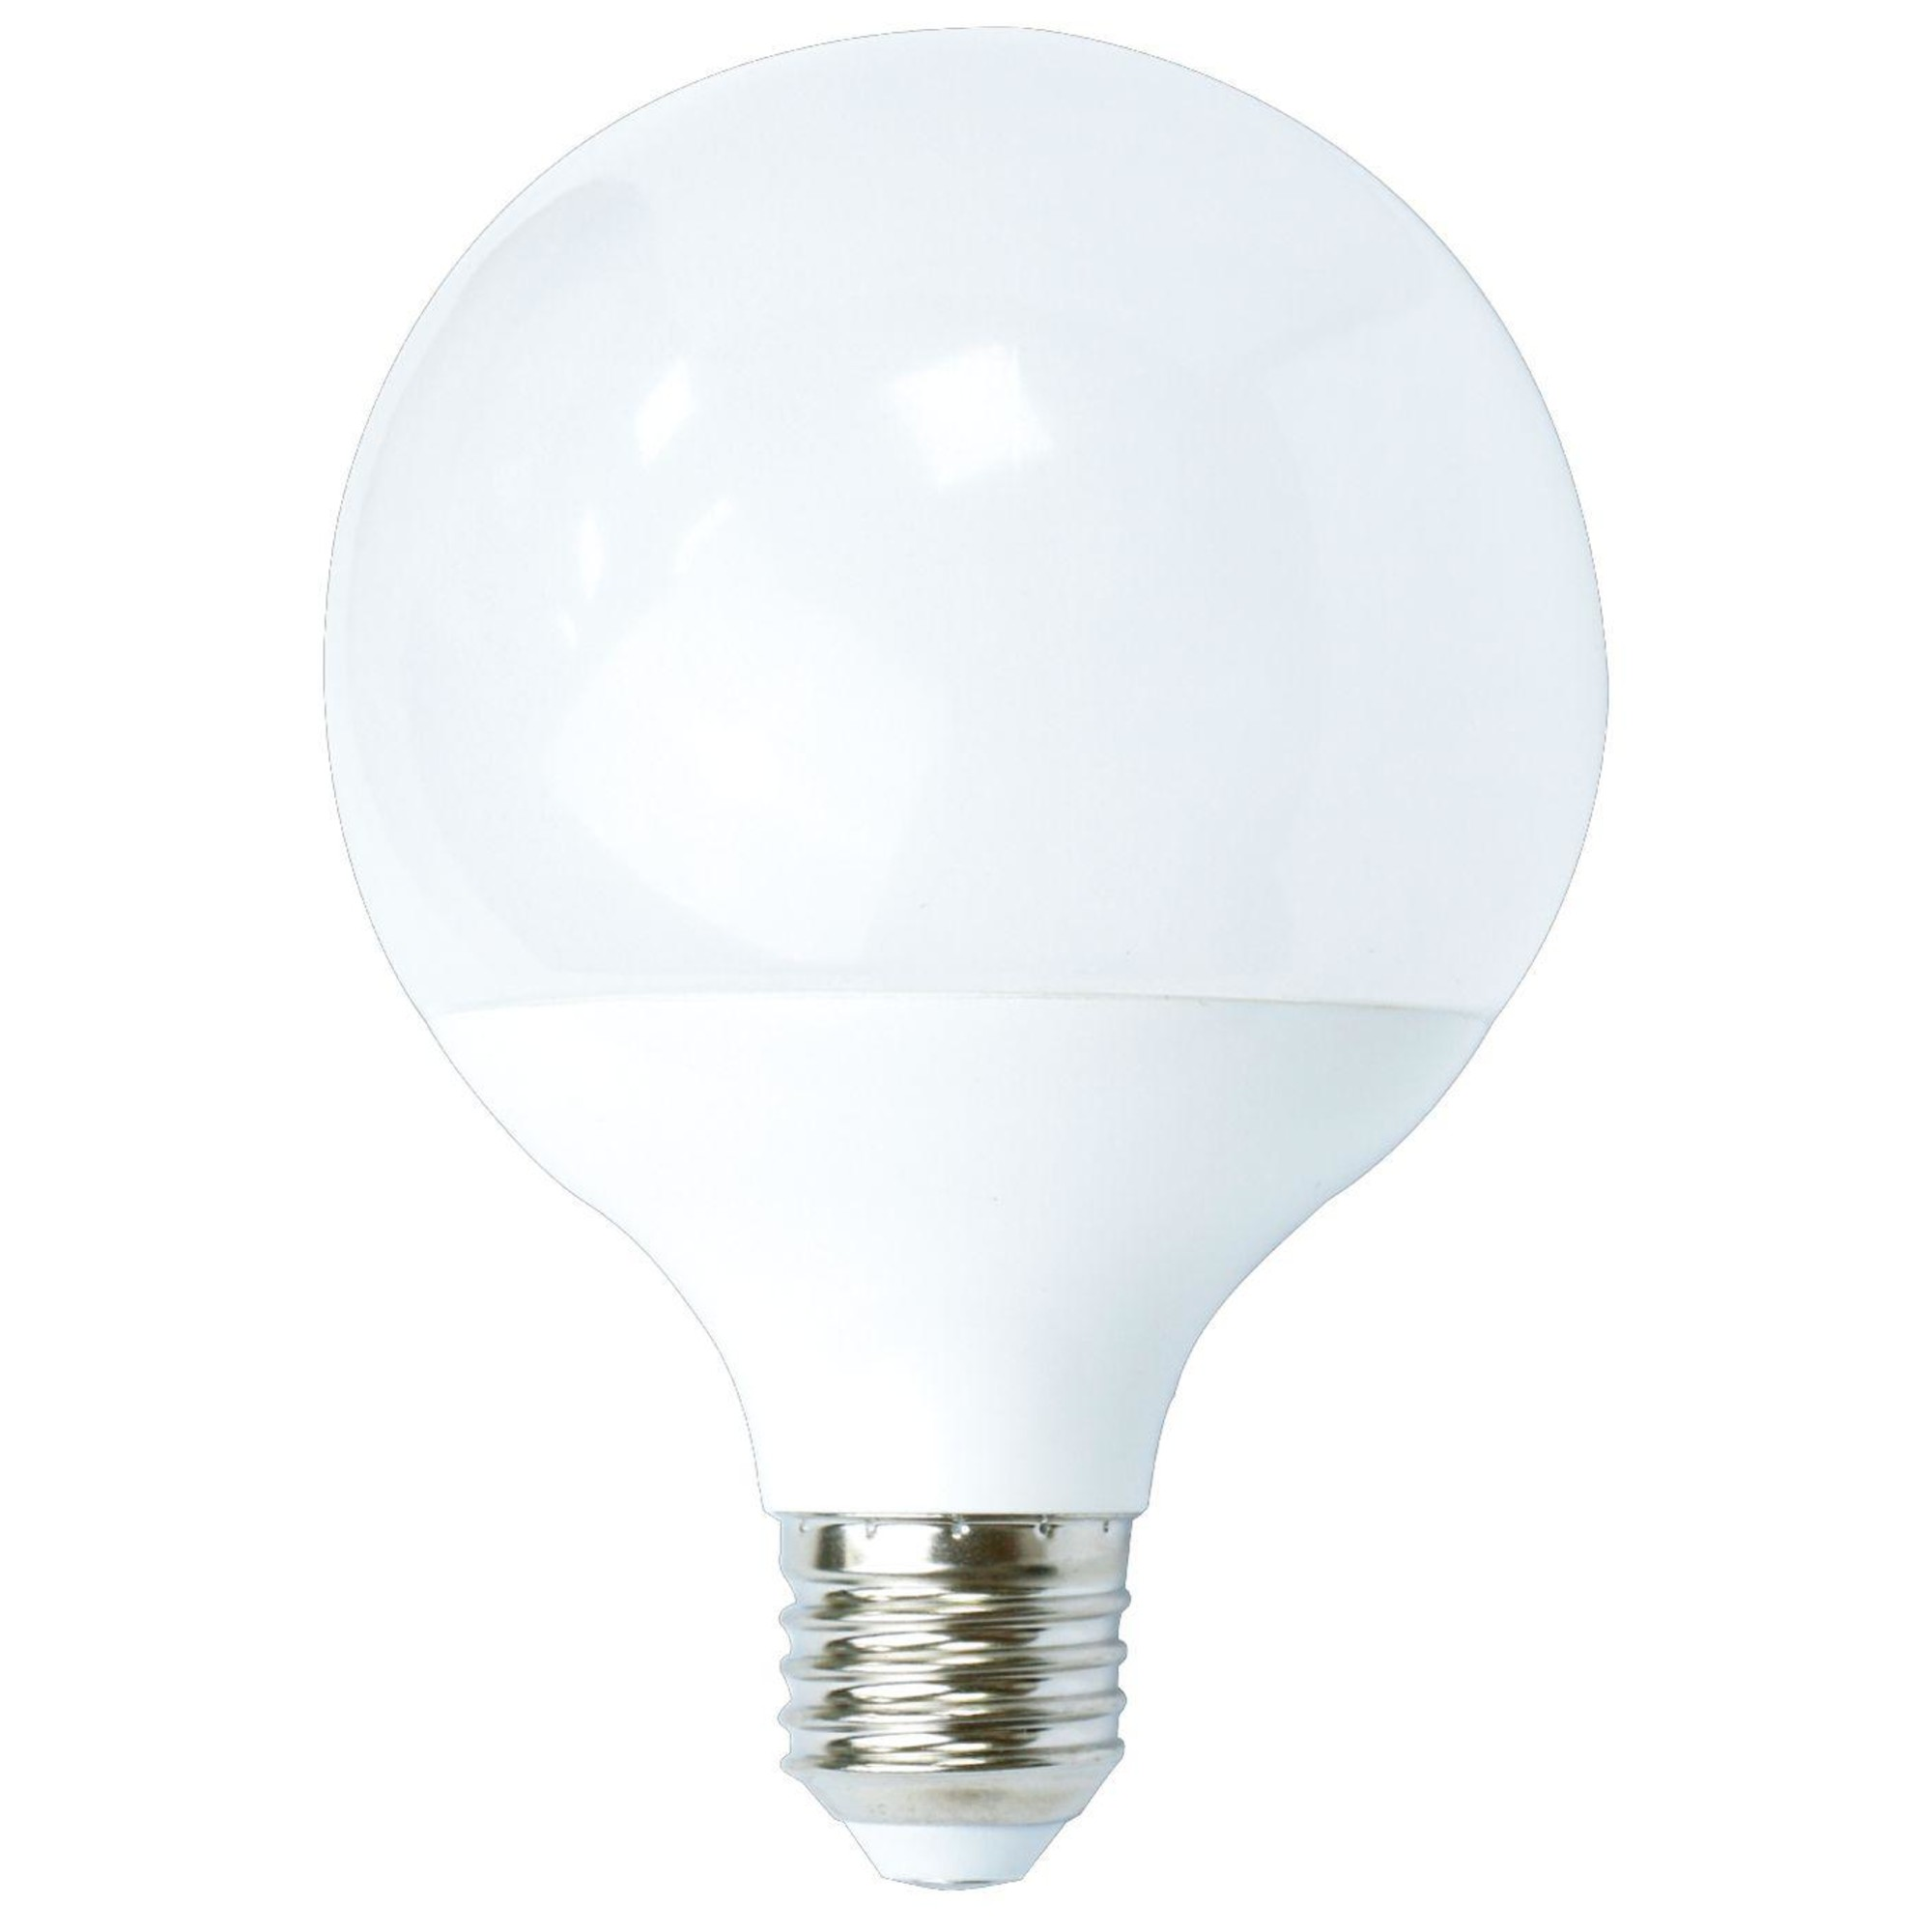 Лампа Ecola Premium светодионая E27 20 Вт шар 1600 Лм теплый свет